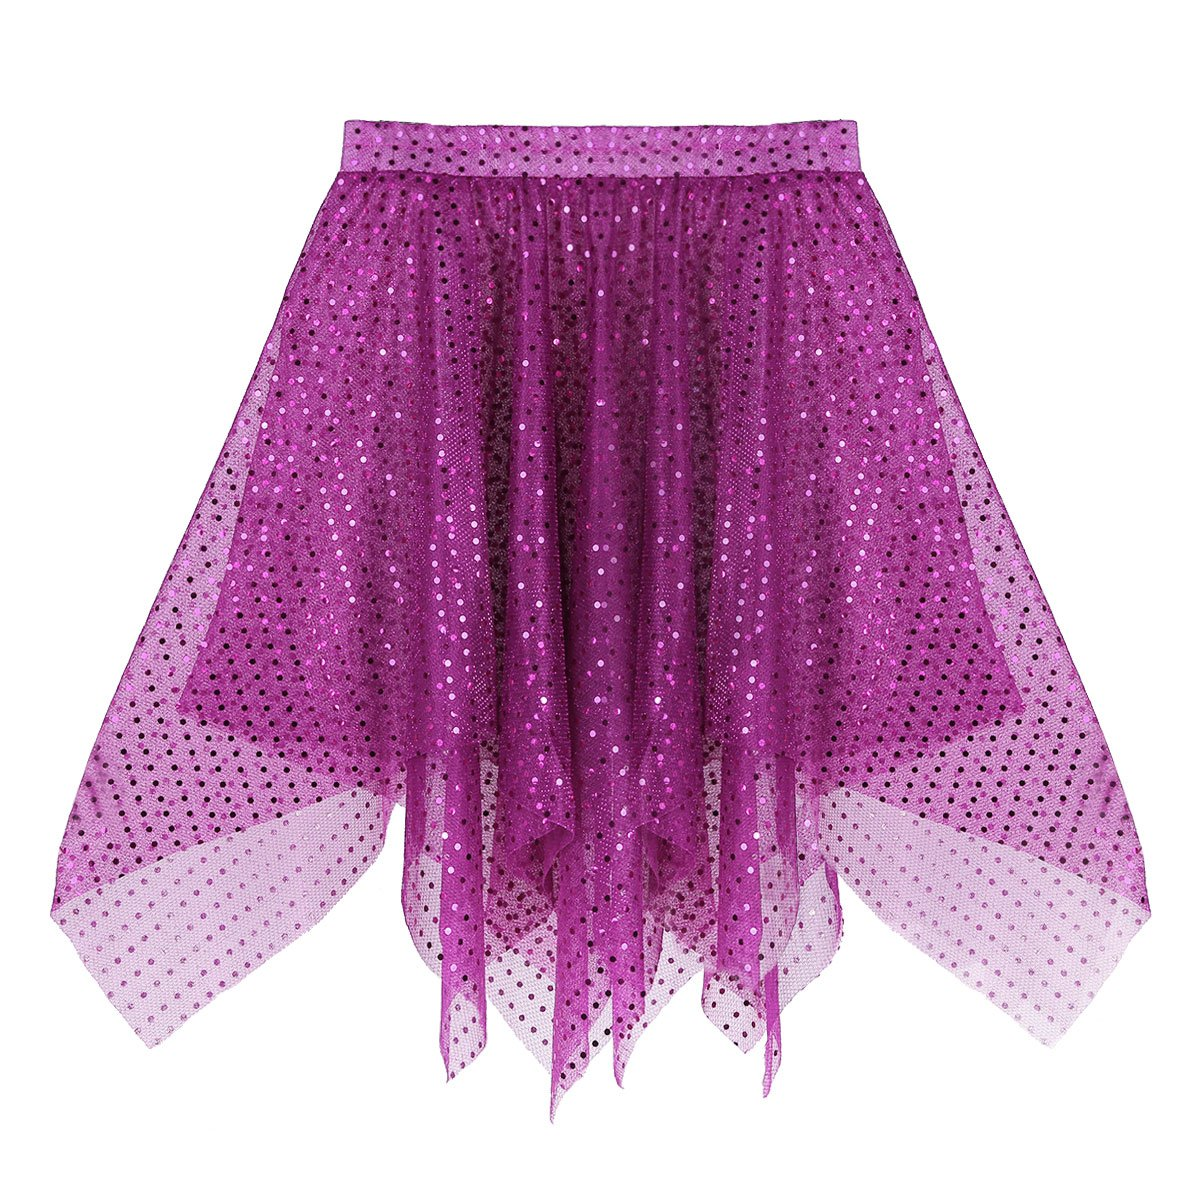 TiaoBug Womans Sparkle Running Asymmetric Layered Skirts City Skirts Running Tutu Ballet Latin Dance Skirt